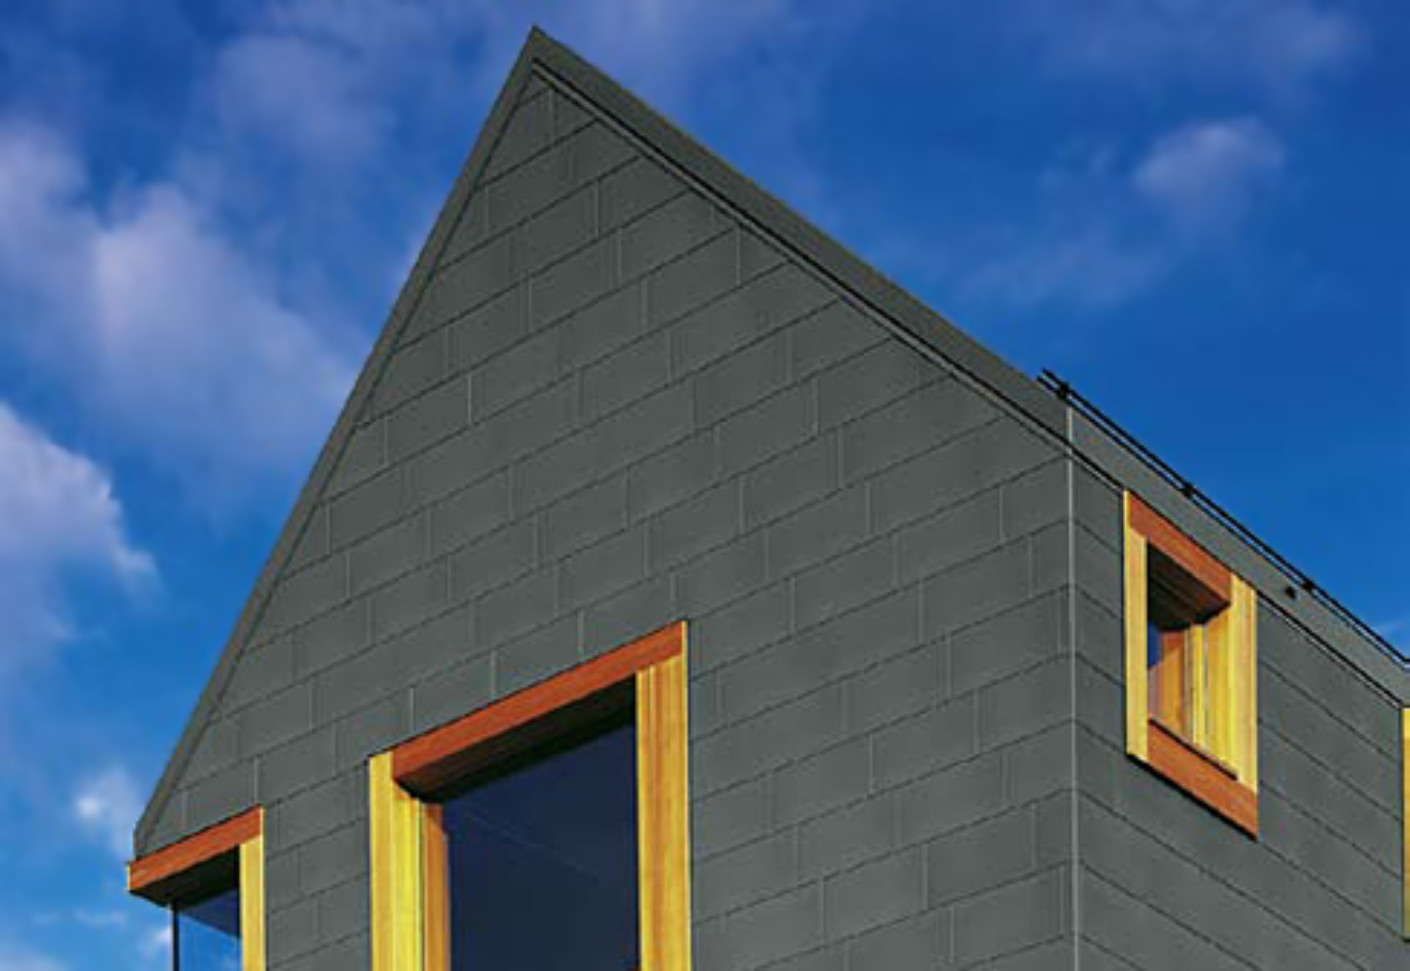 Tile Systems Pre Weathered Pro Graphite Grey By Rheinzink STYLEPARK